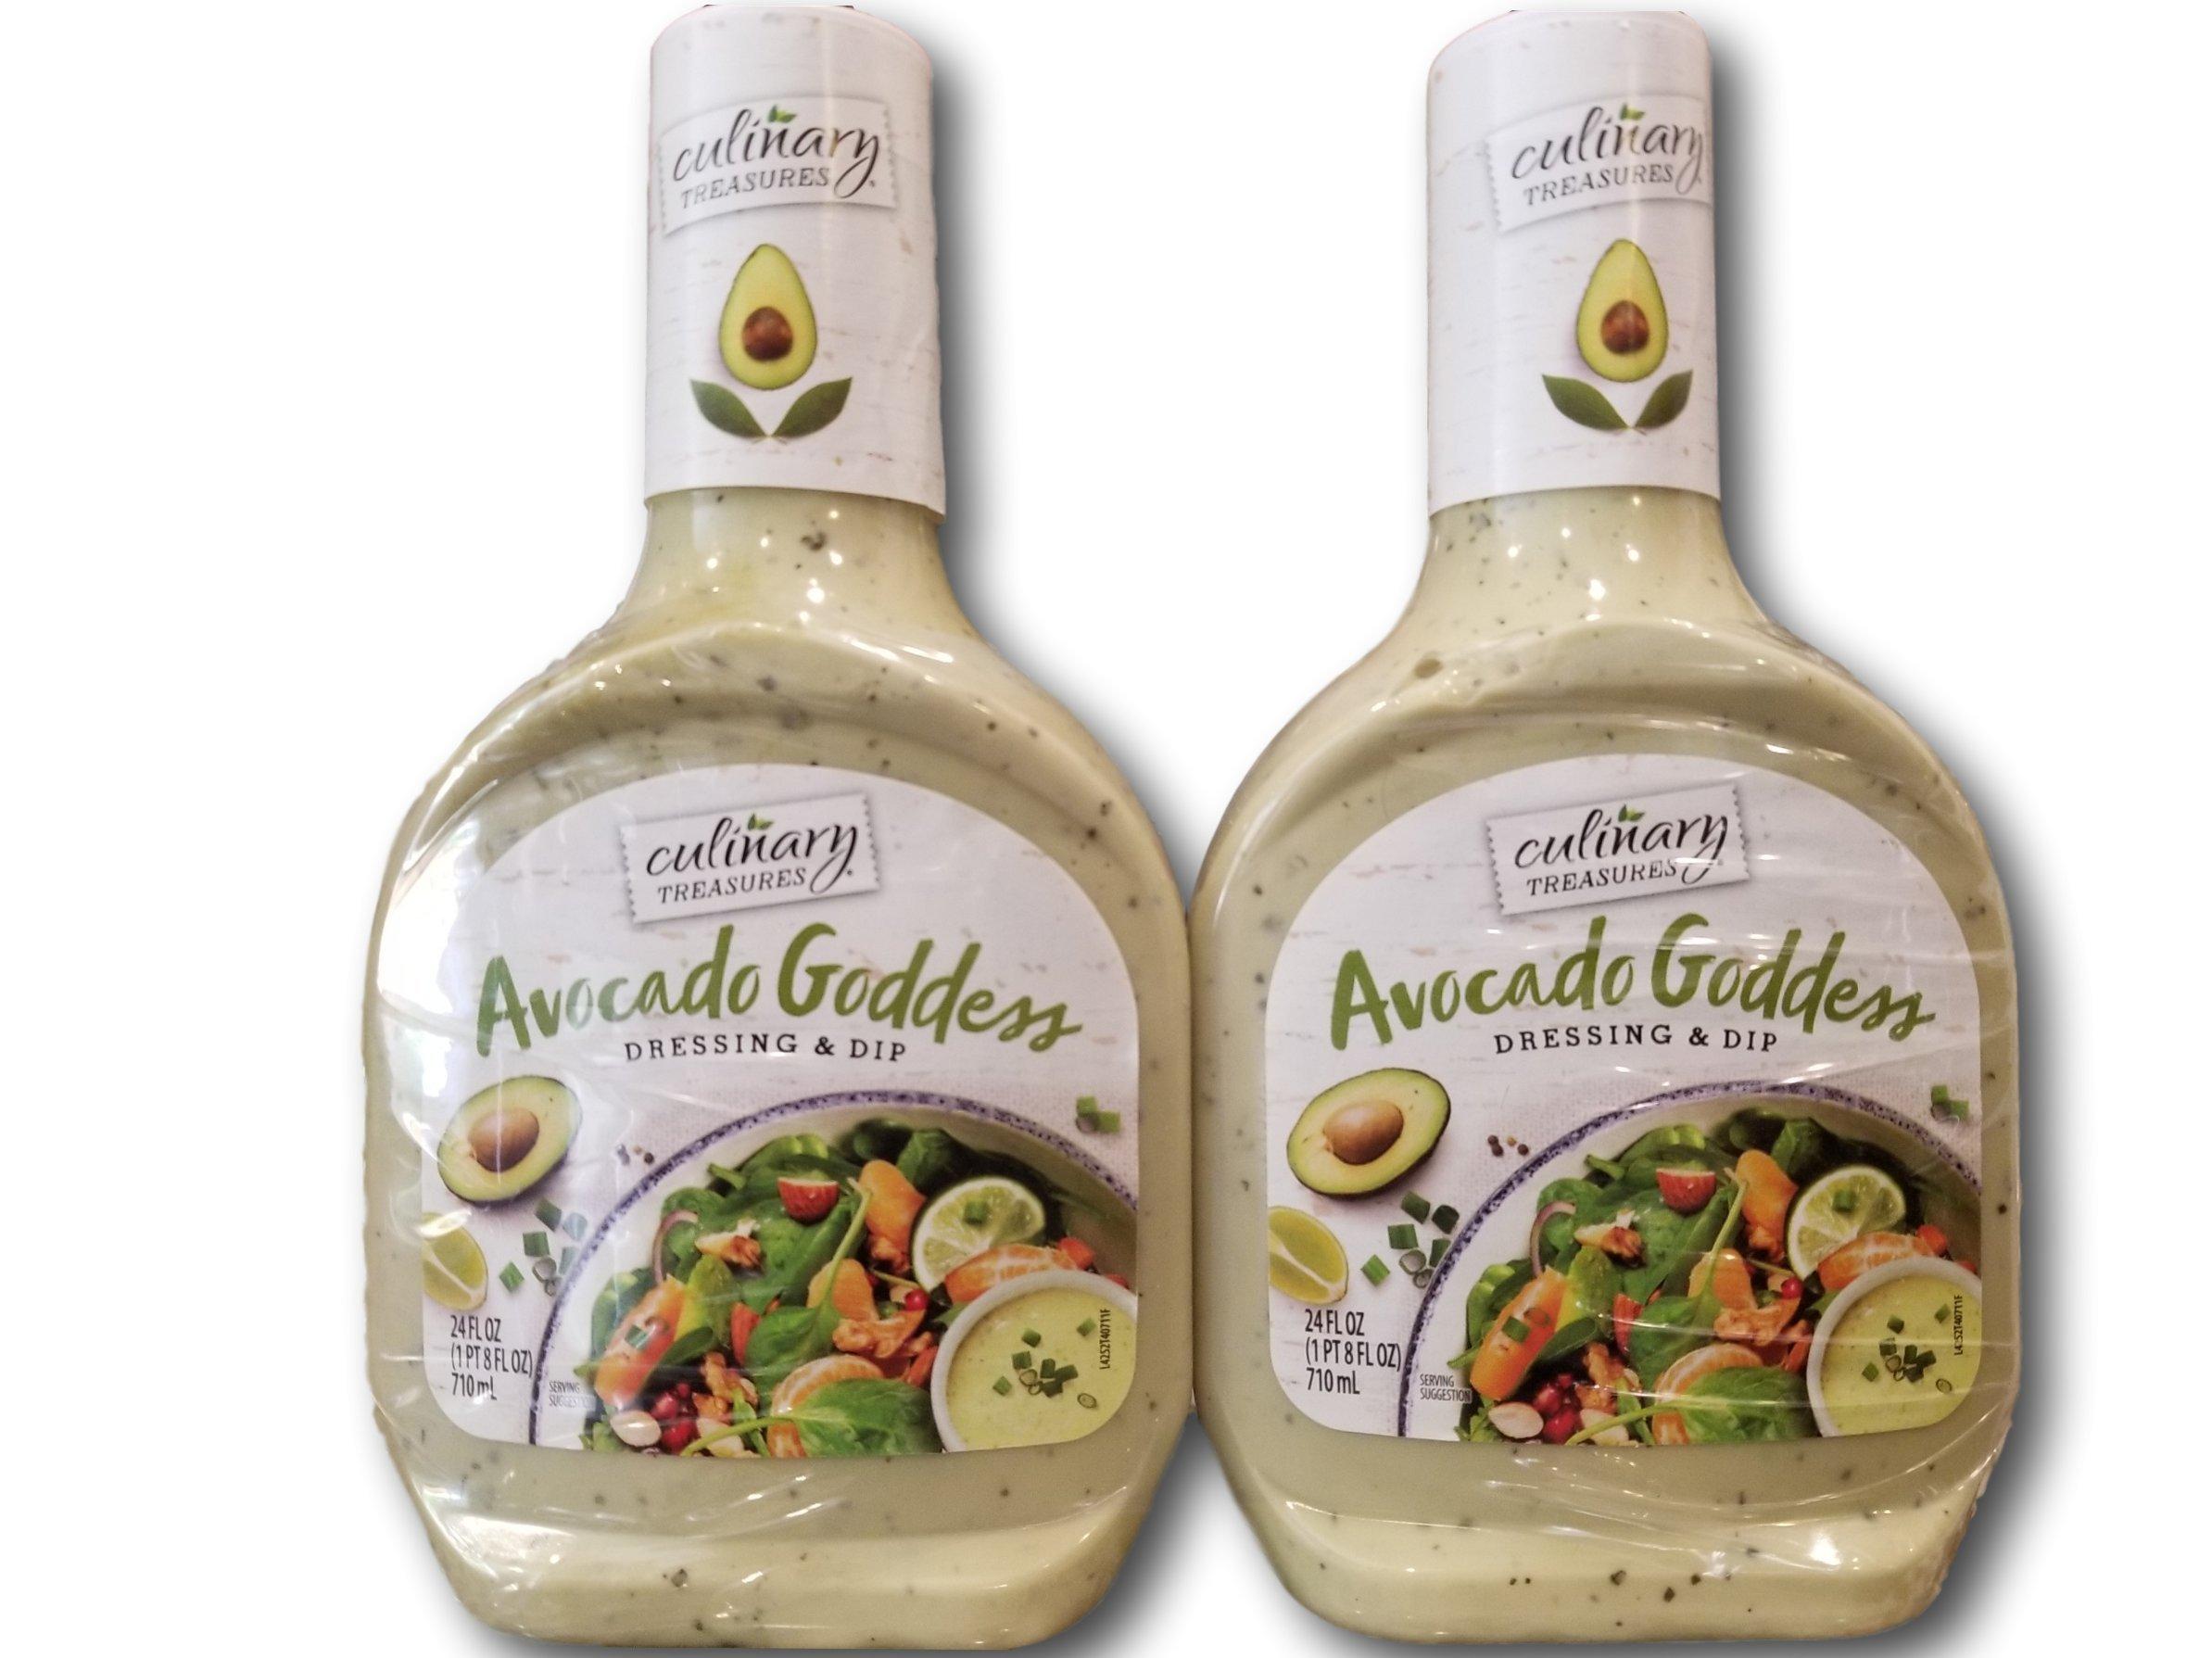 Culinary Treasures Avocado Goddess Salad Dressing & Dip (2 Pack- 2x24 fl oz)